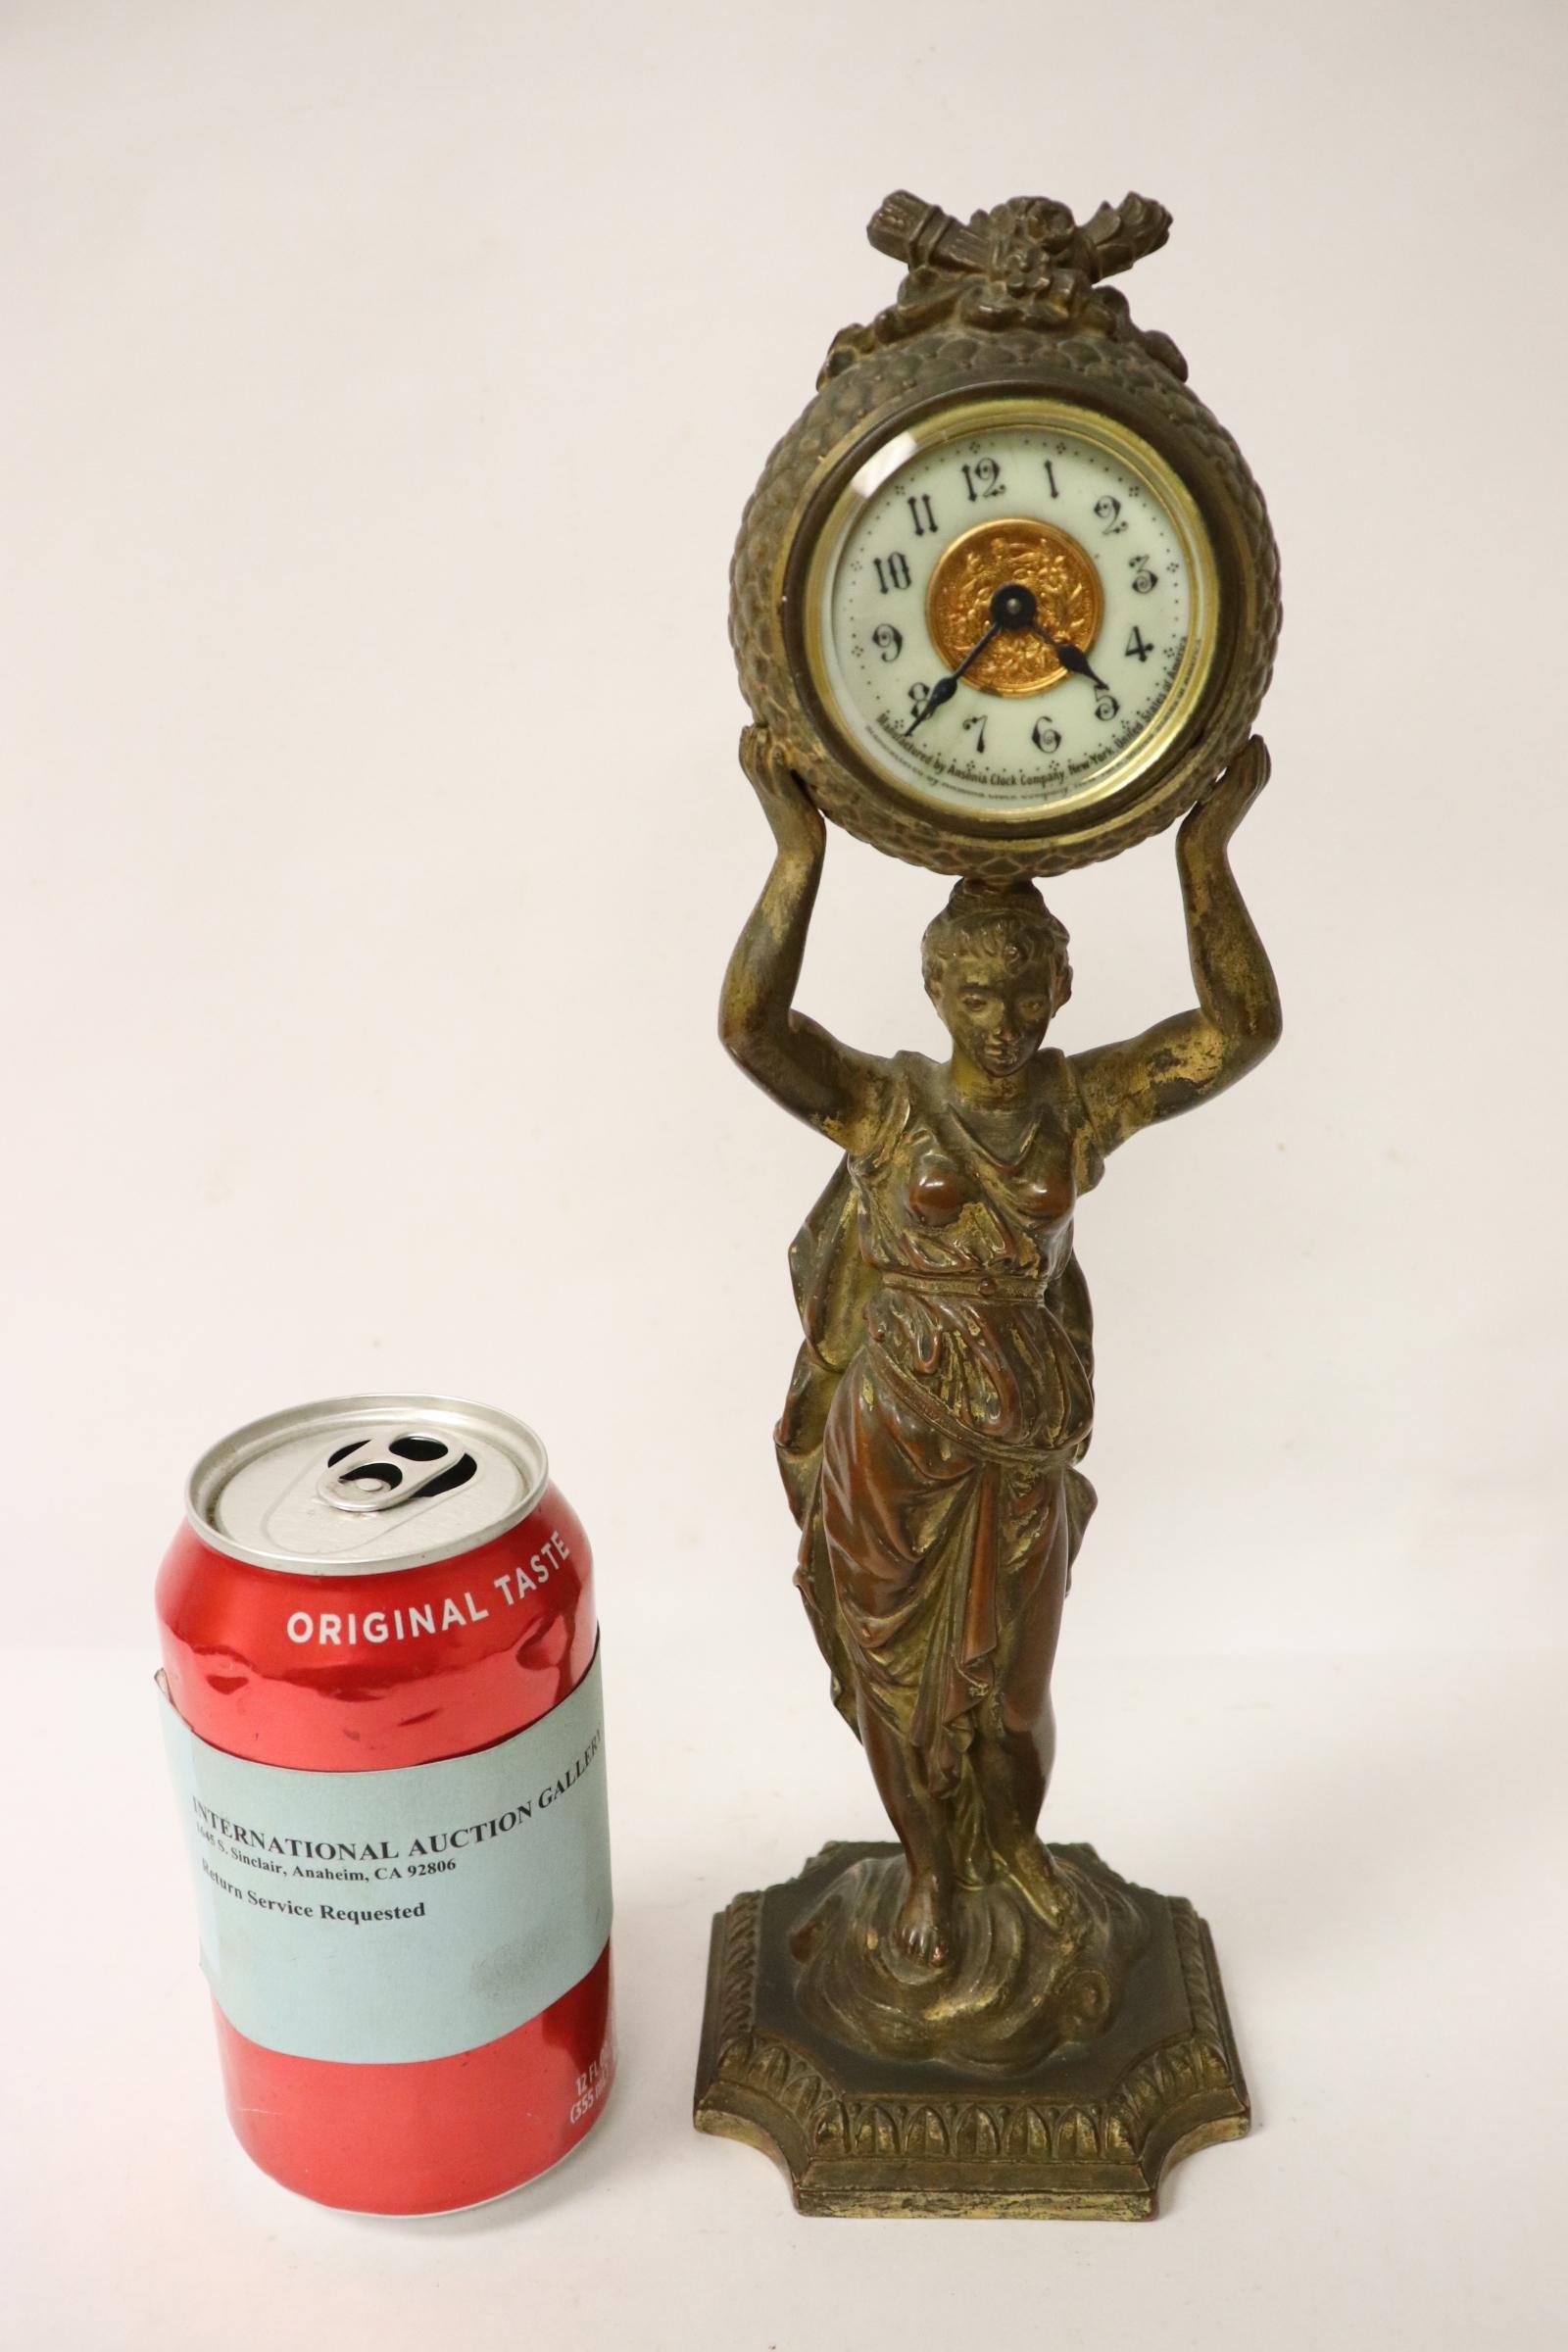 Gilt metal table clock with figure motif base